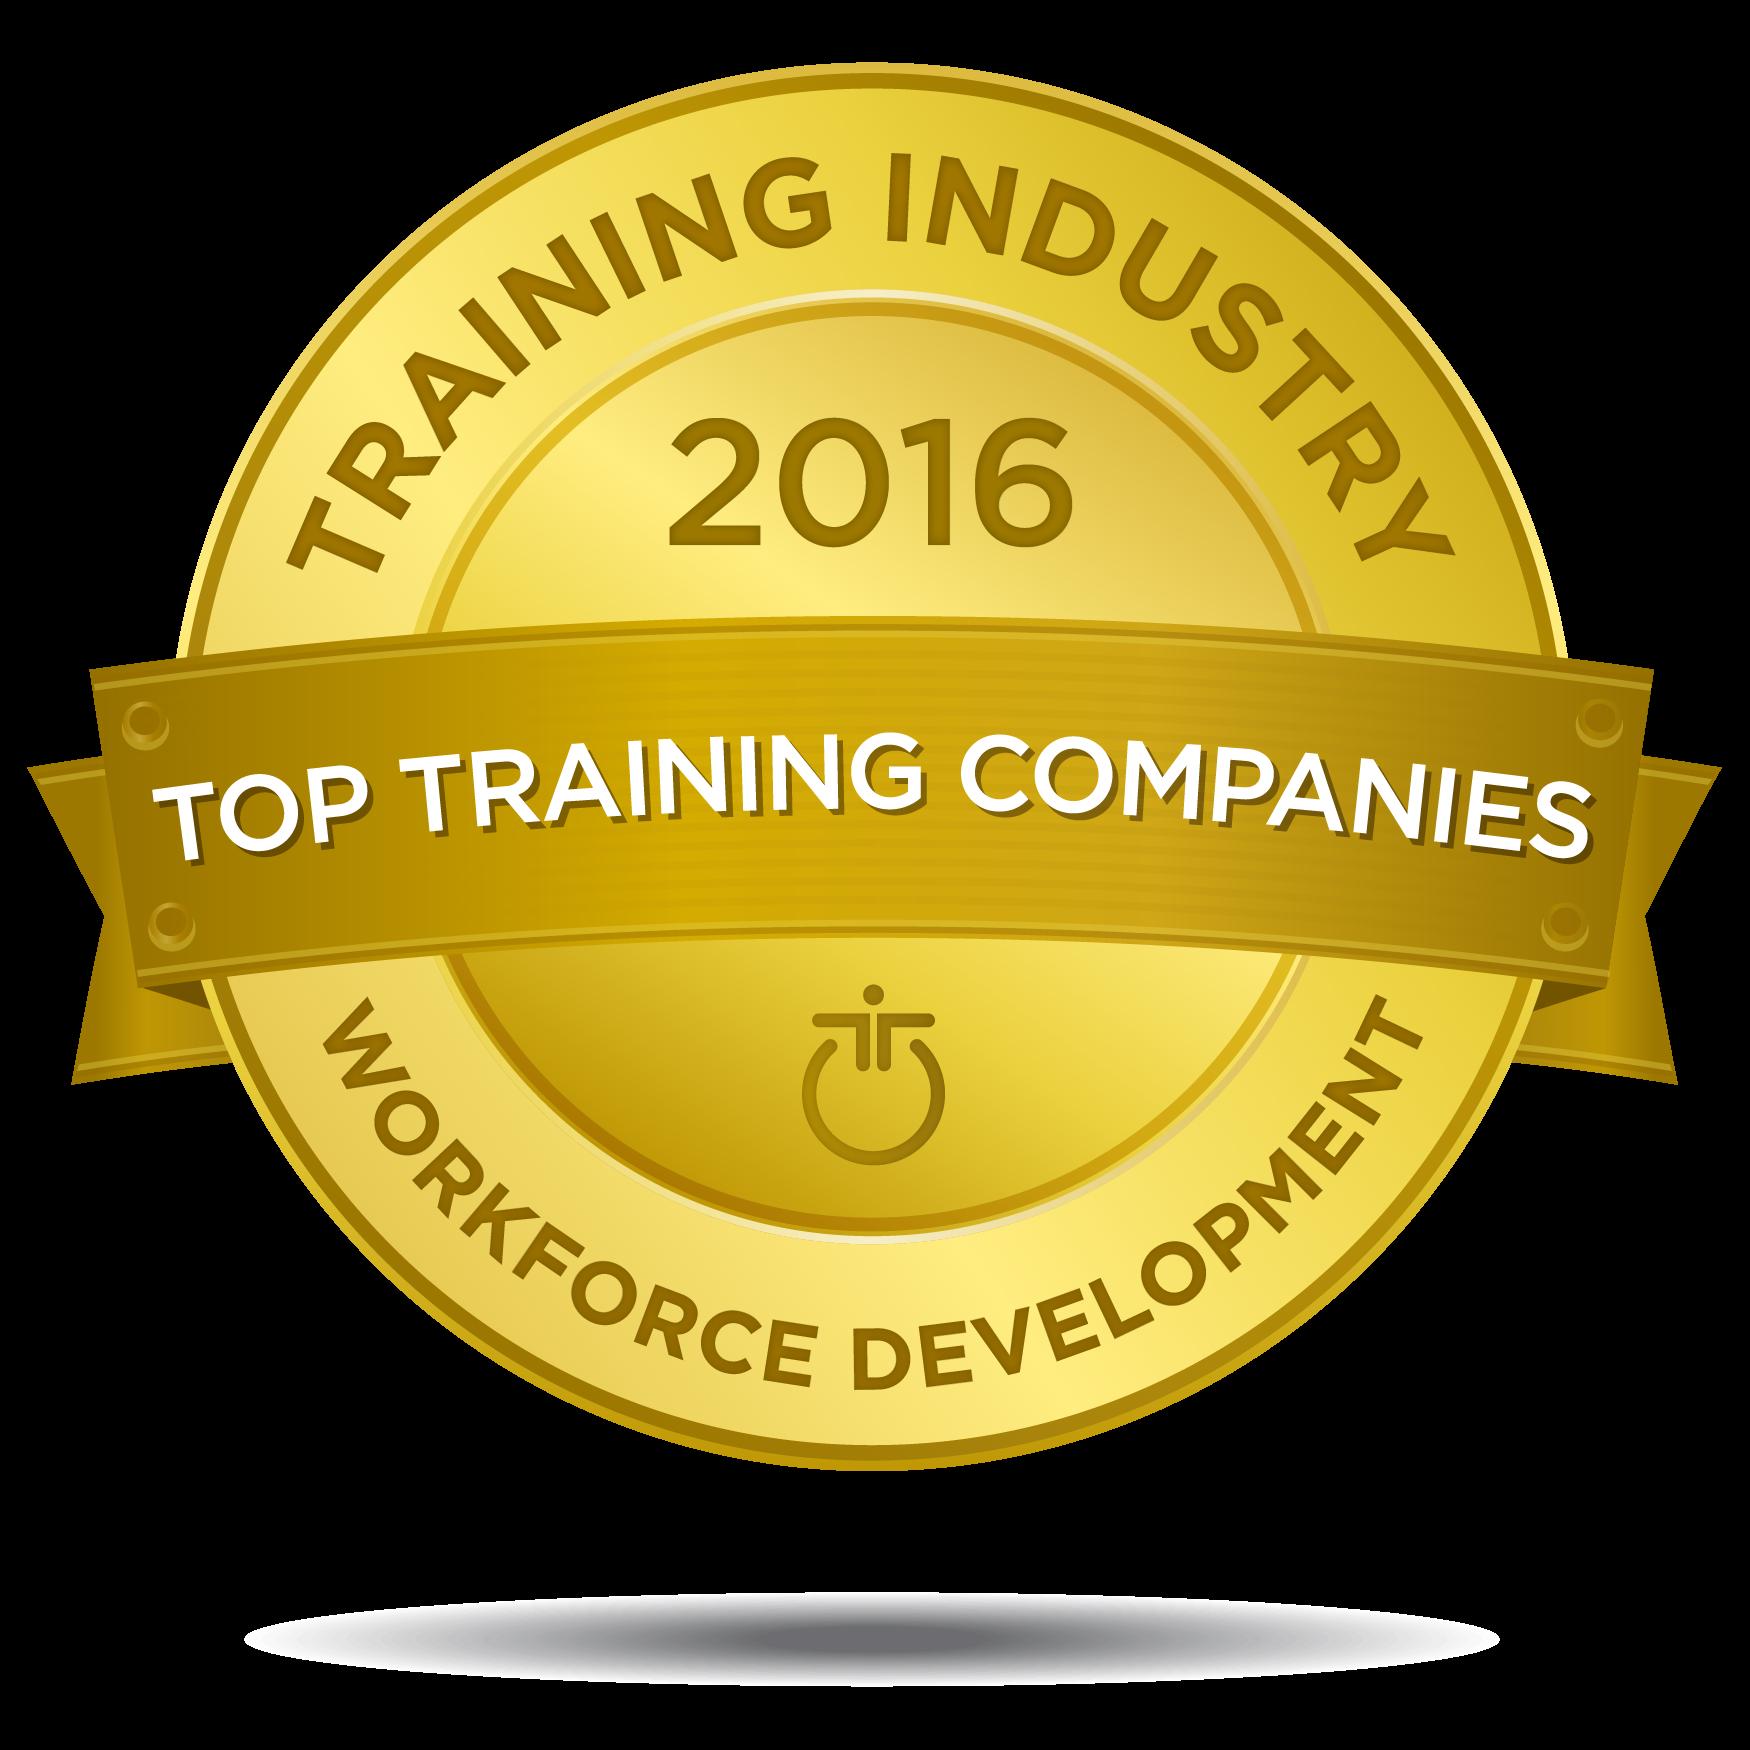 2016 workforce development.png